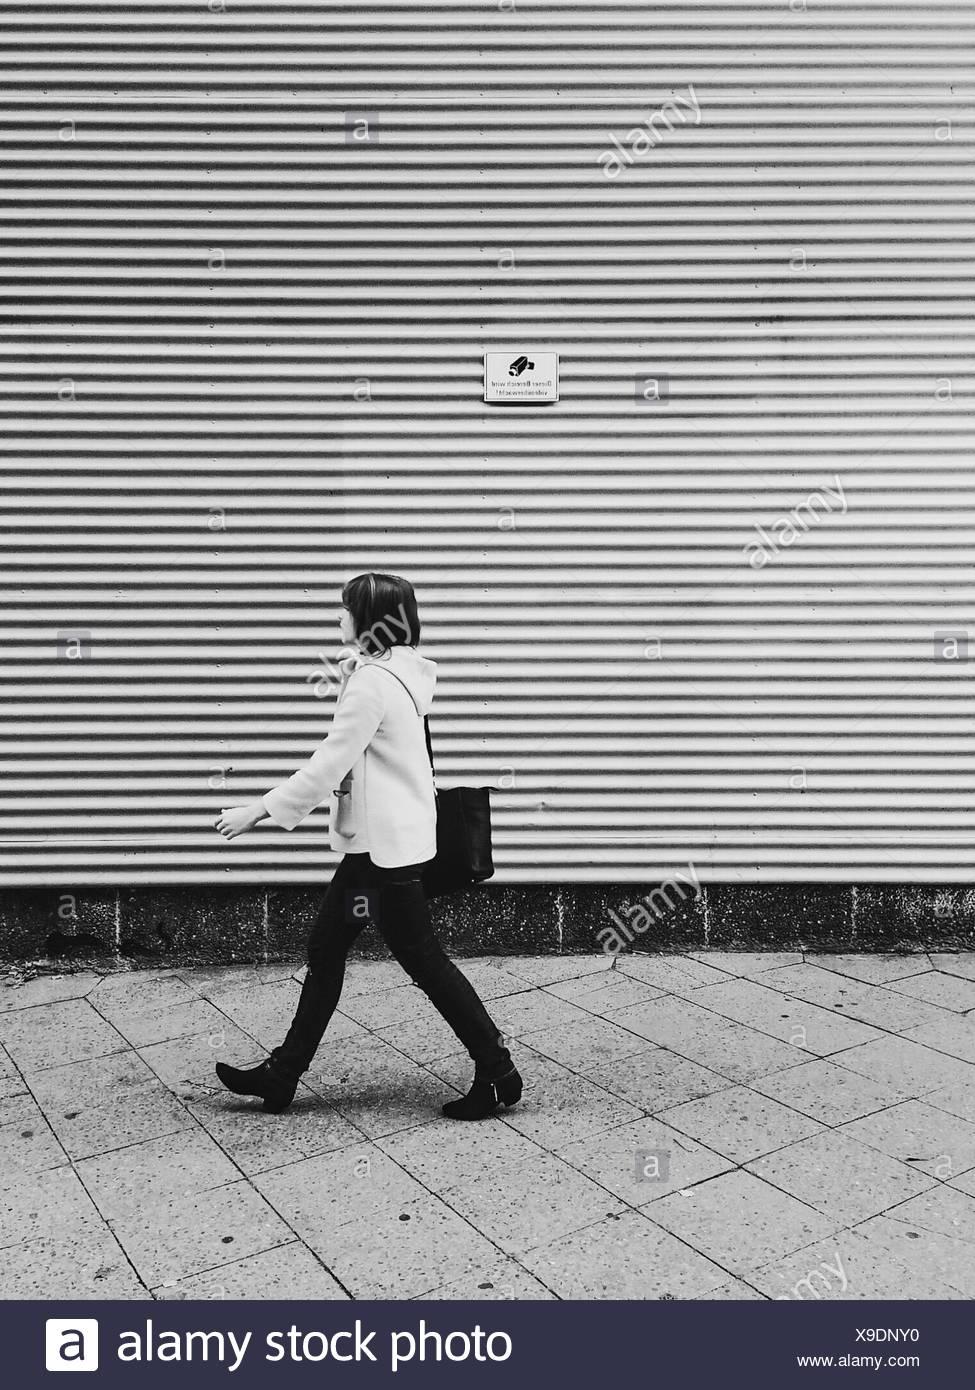 Side View Of Woman Walking On Sidewalk Against Shutter - Stock Image